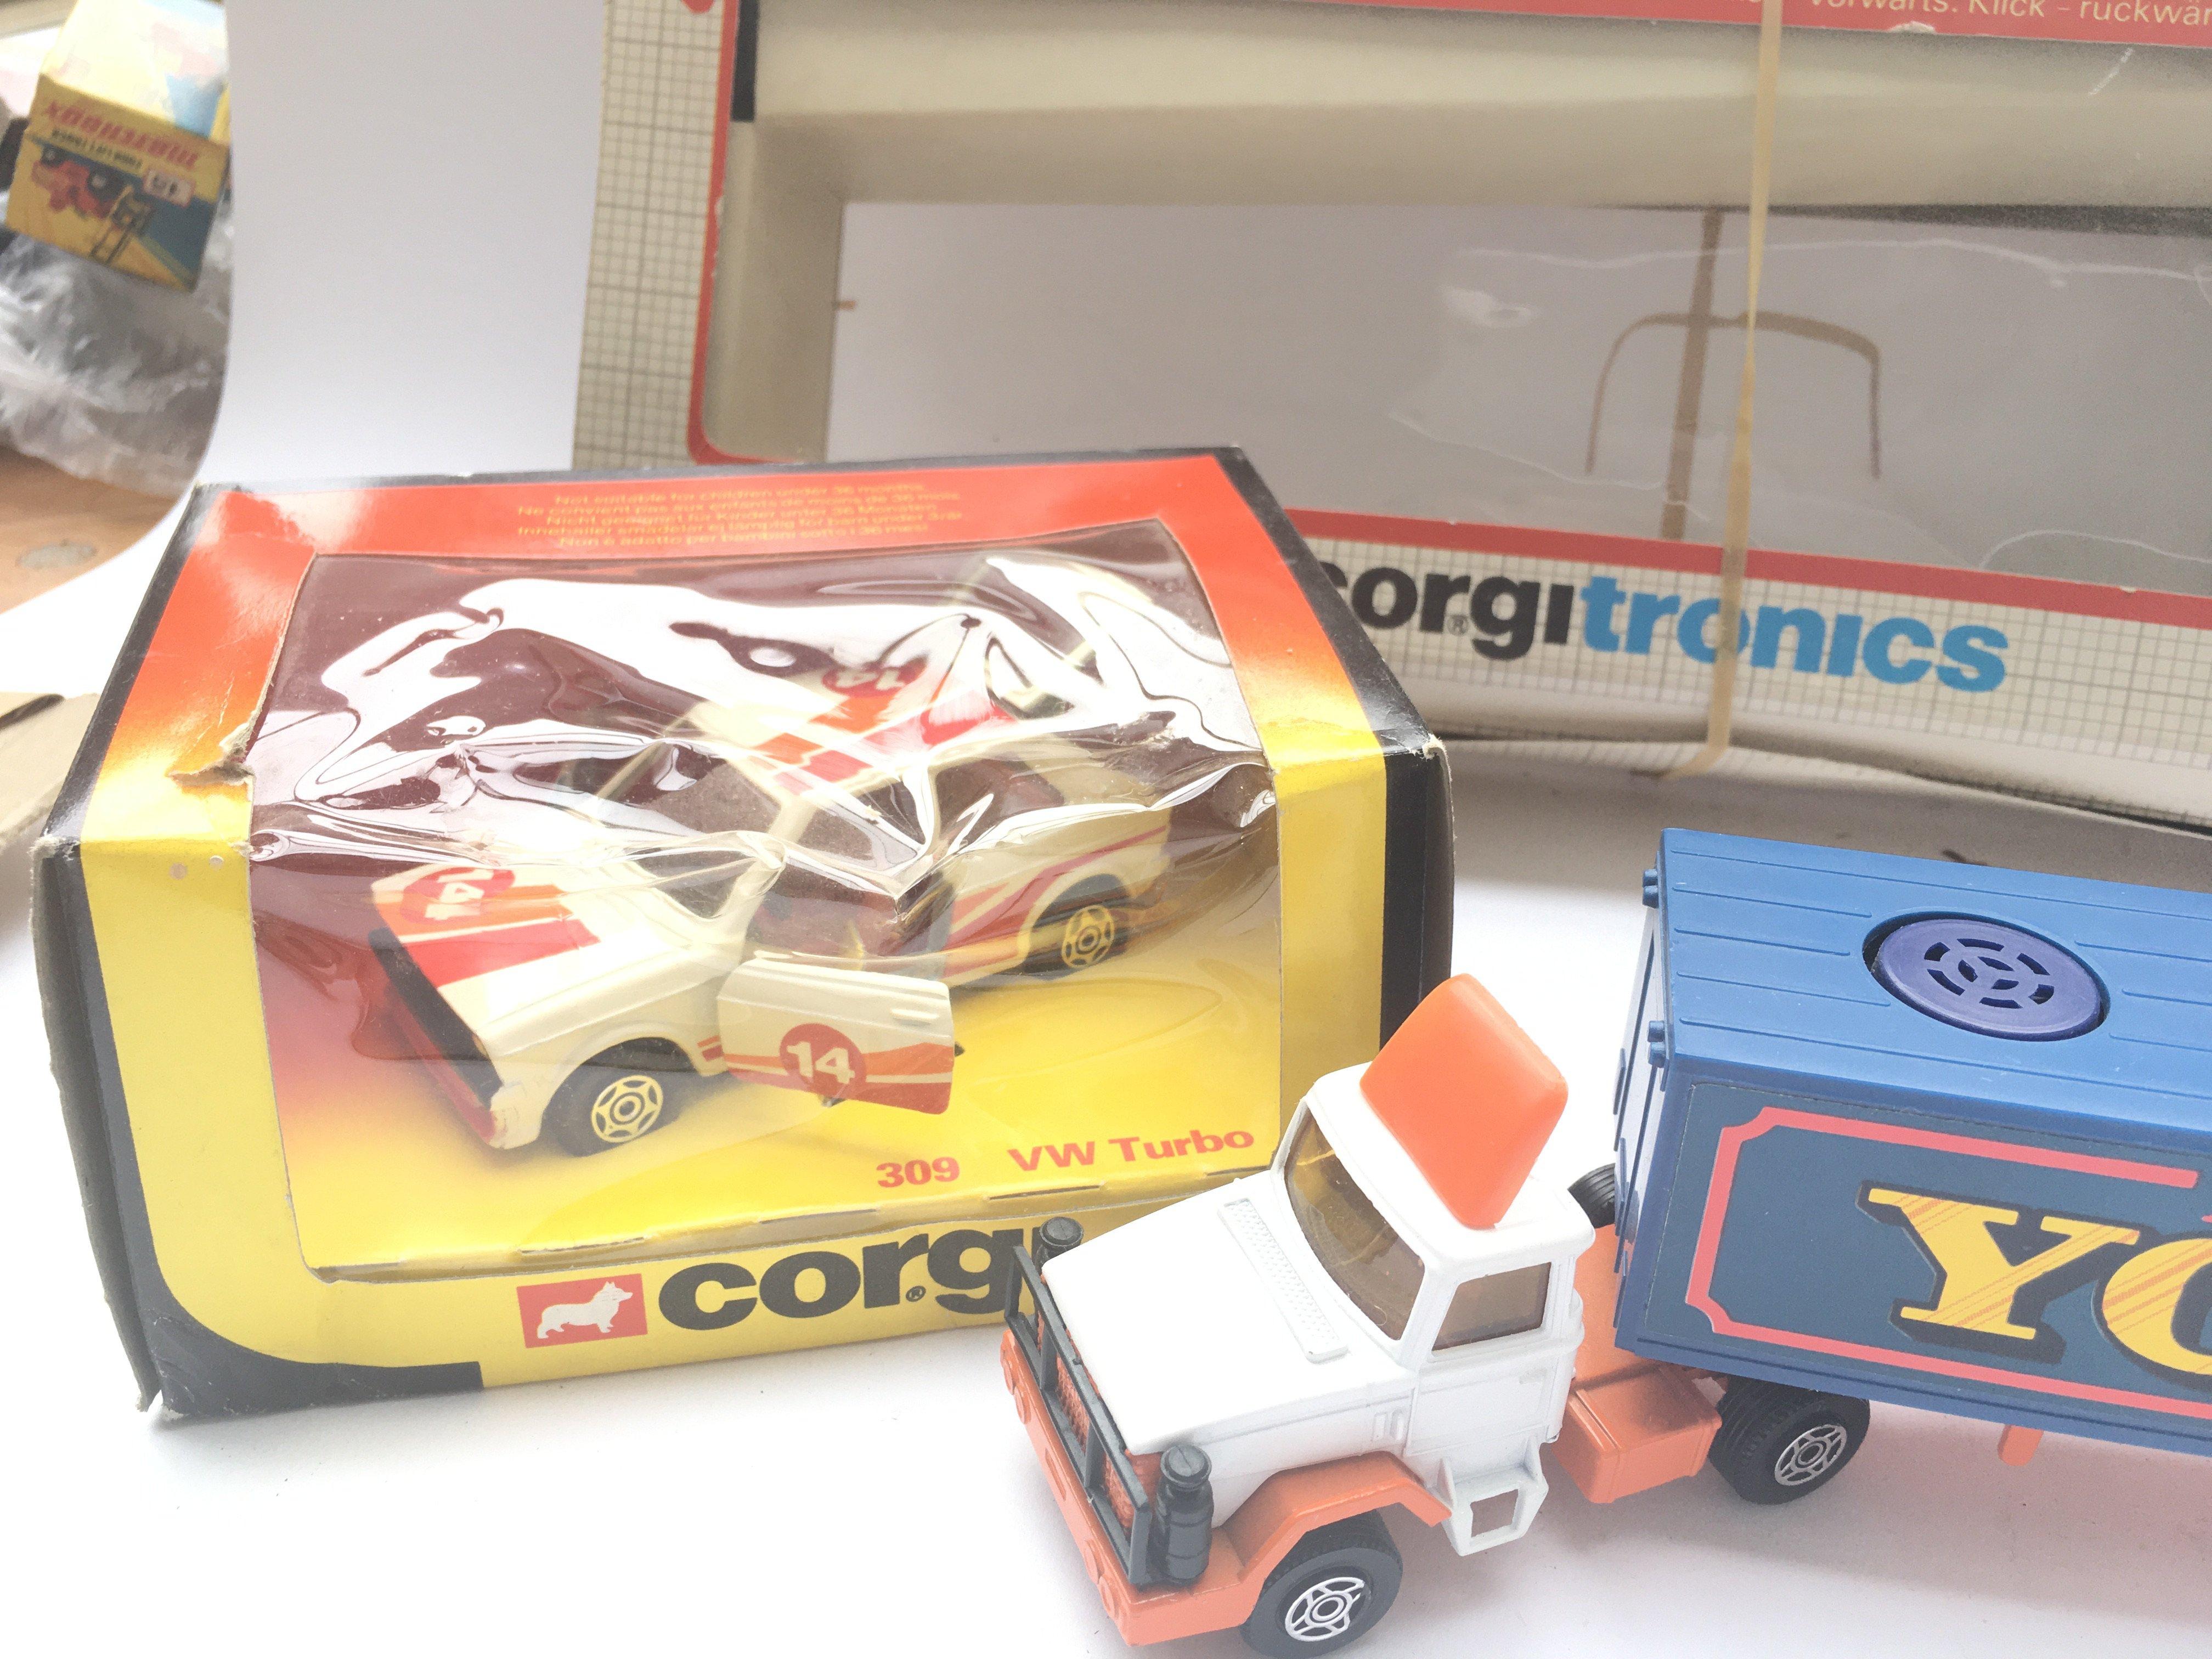 2 x Corgitronic Vehicles #1002 (control missing) a - Image 3 of 4